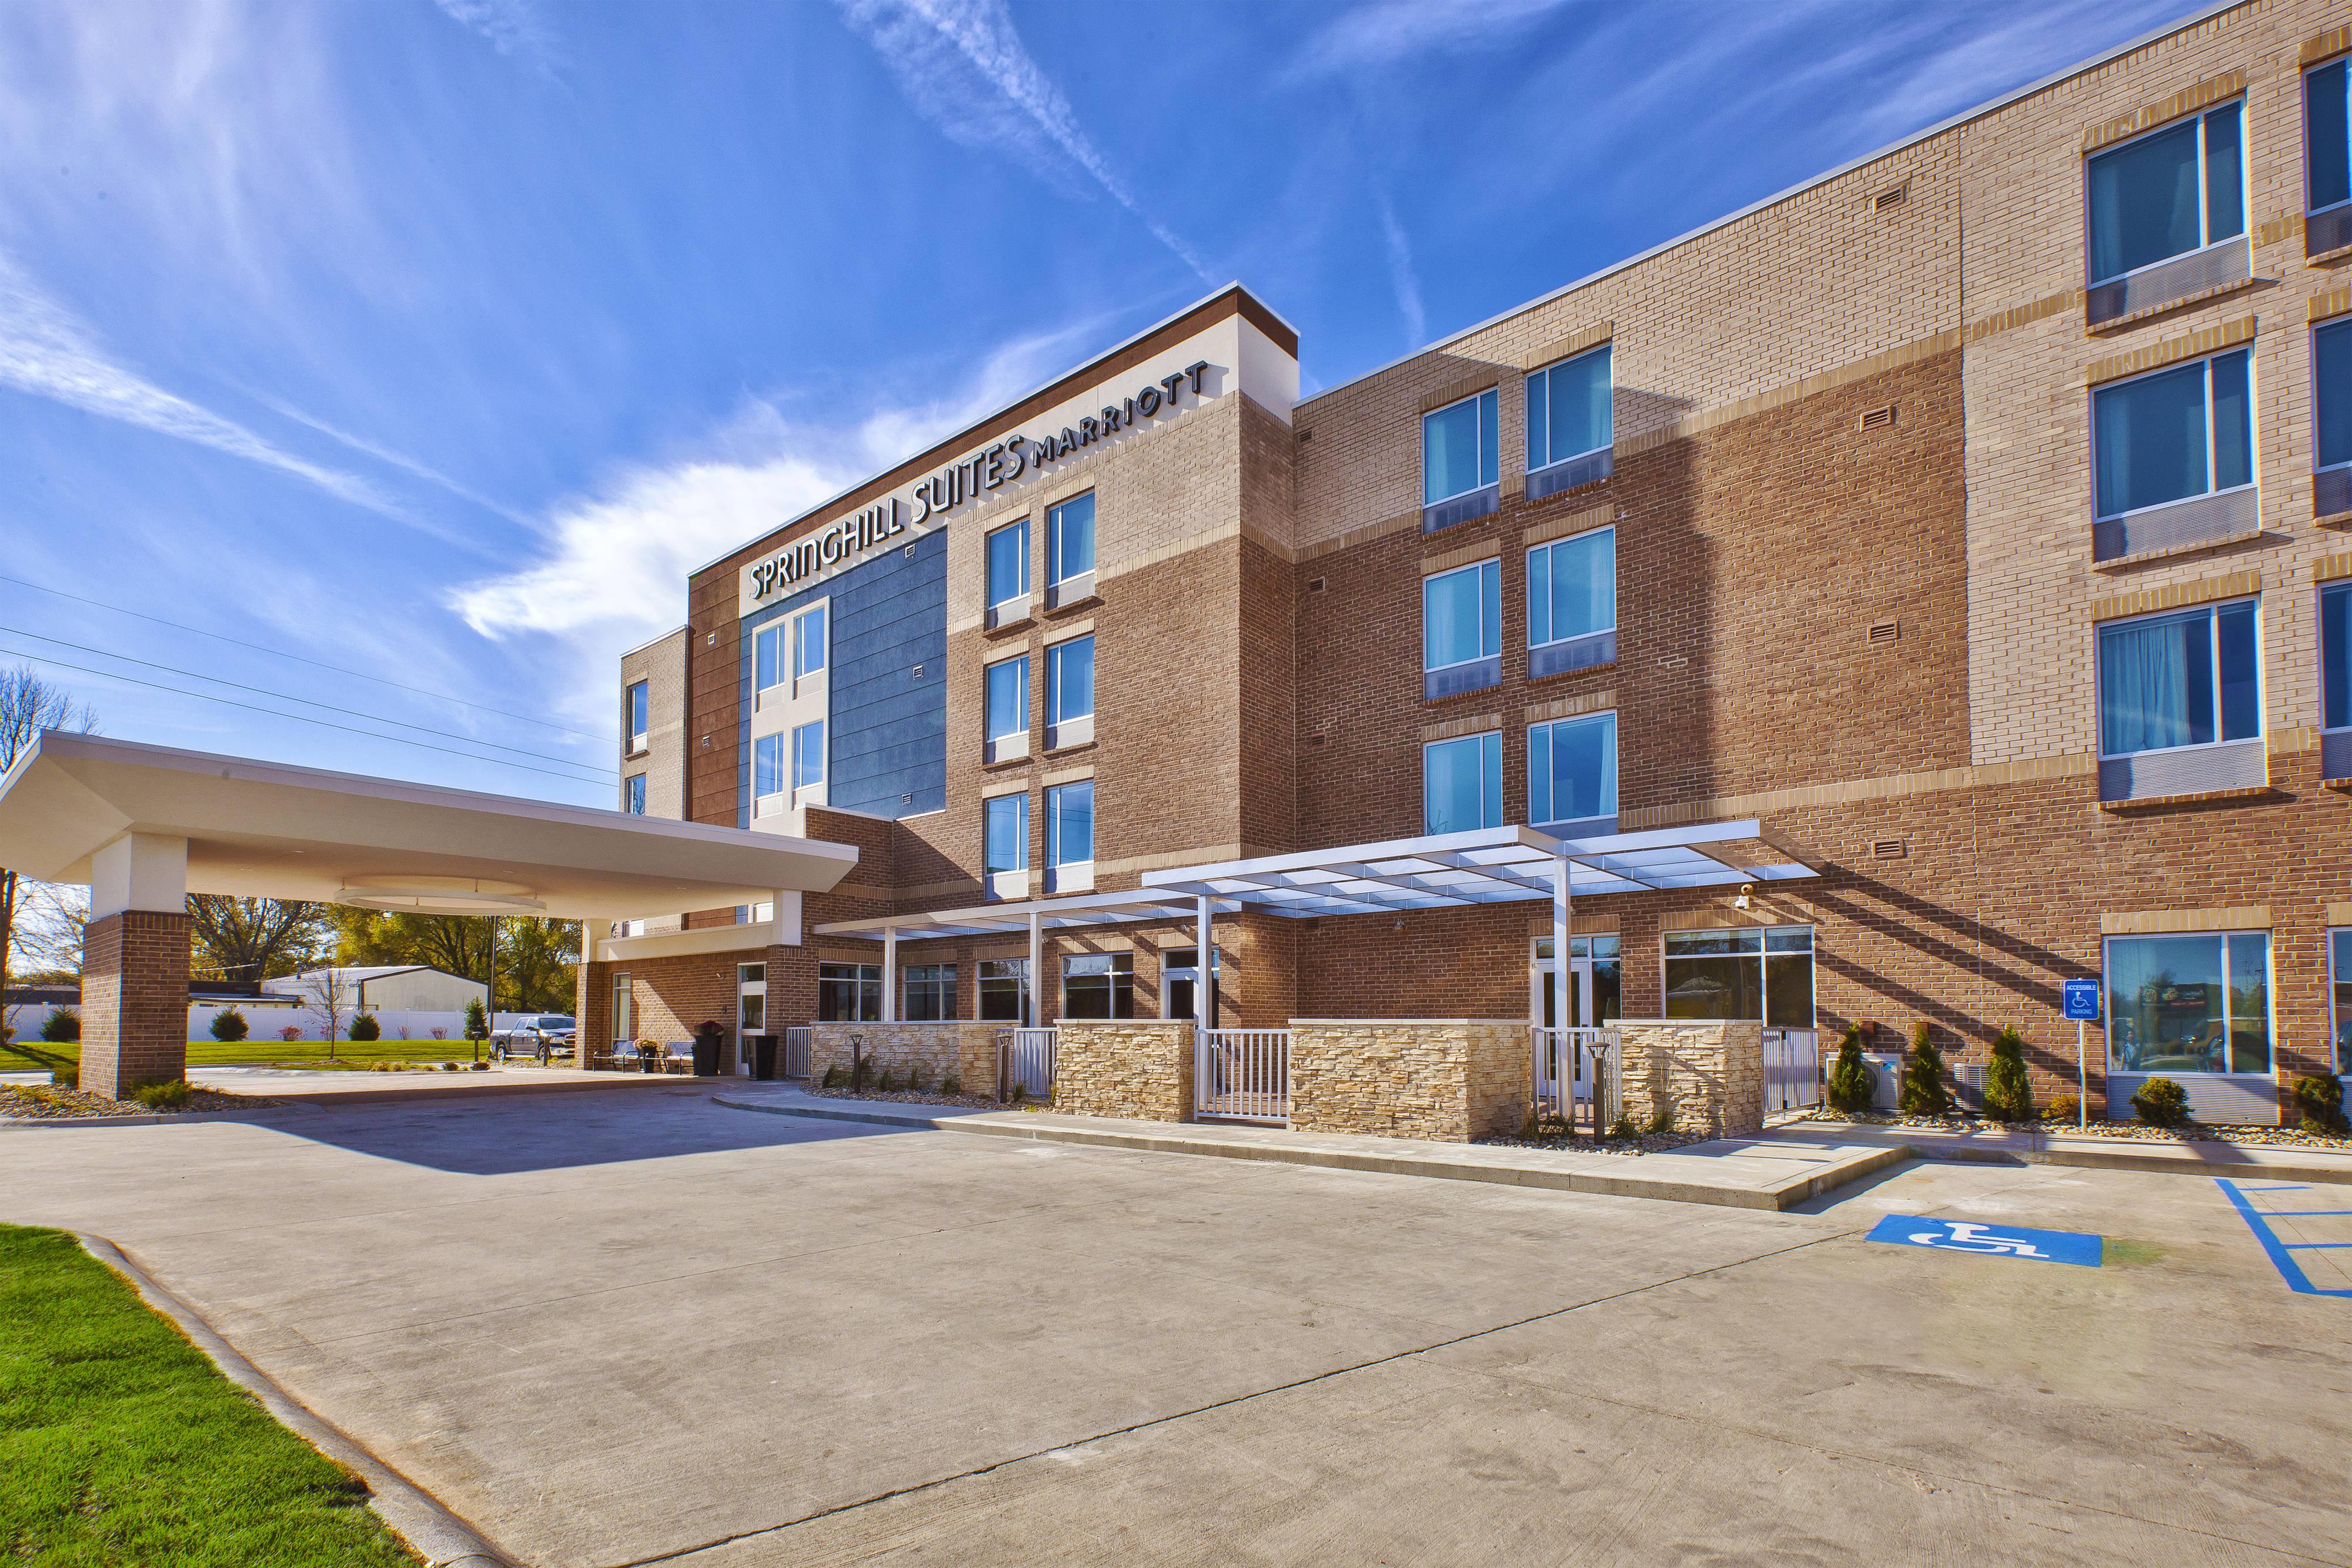 Springhill Suites By Marriott Benton Harbor St. Joseph